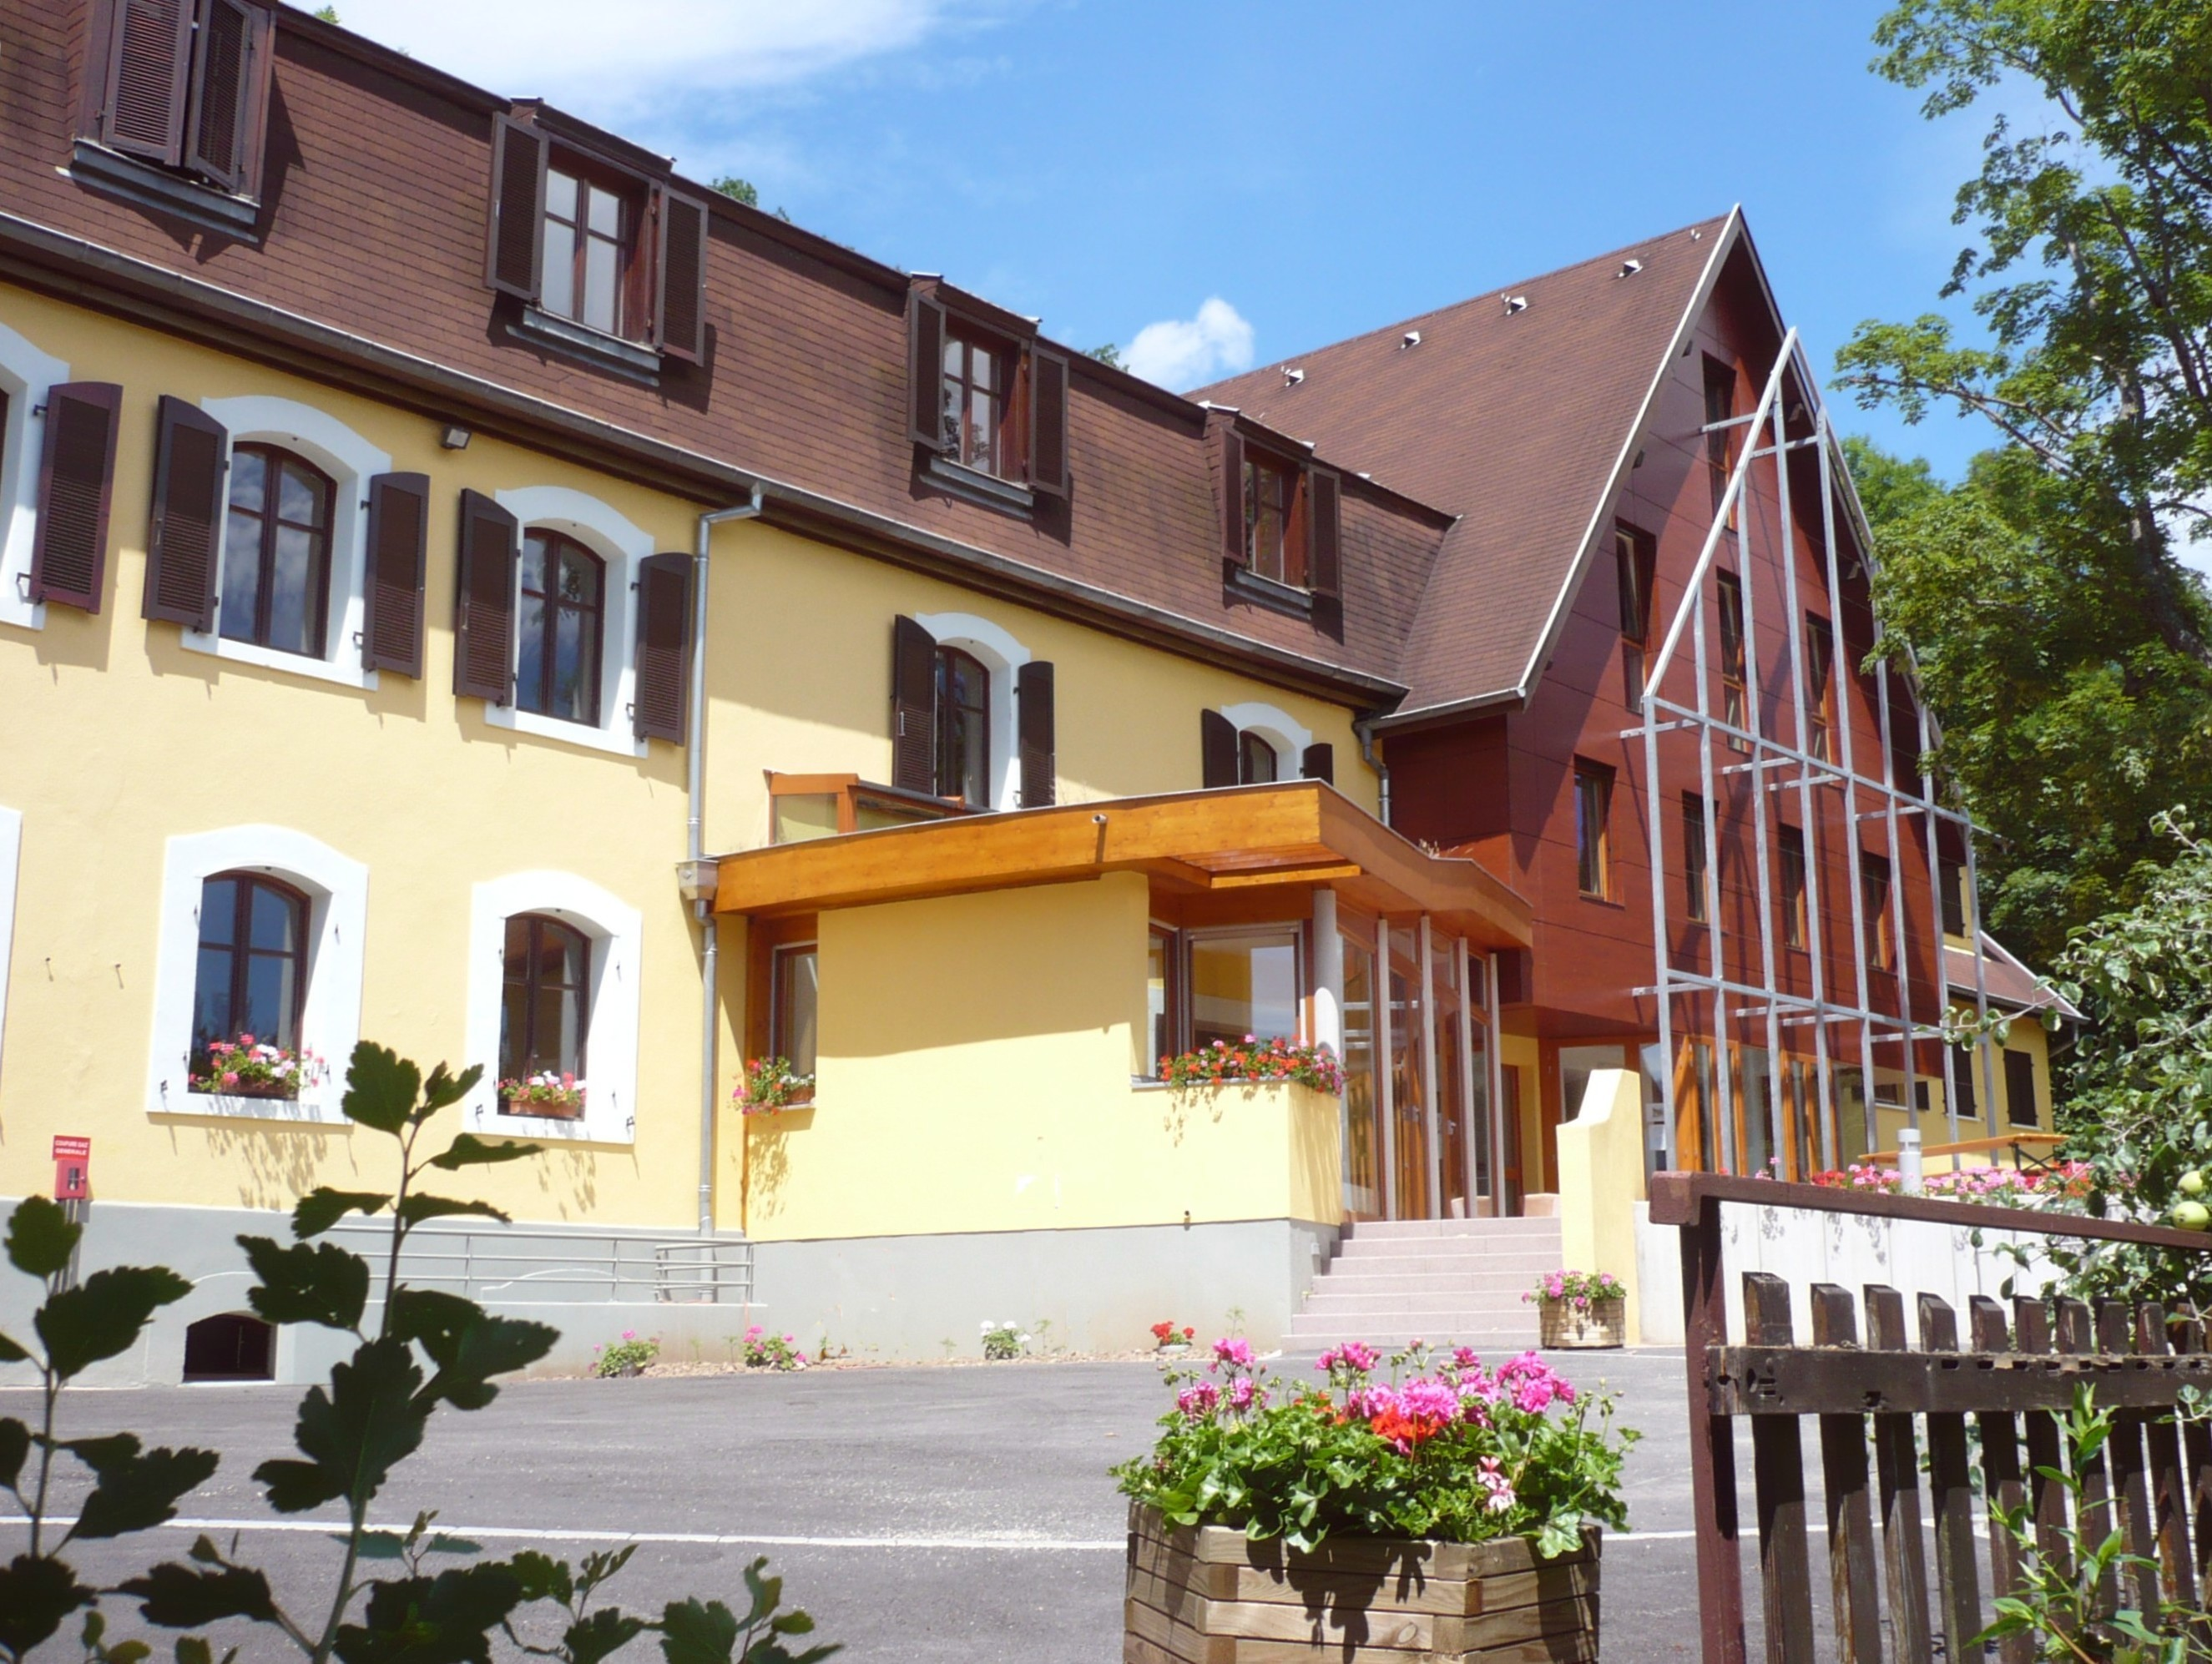 La Maison du Kleebach